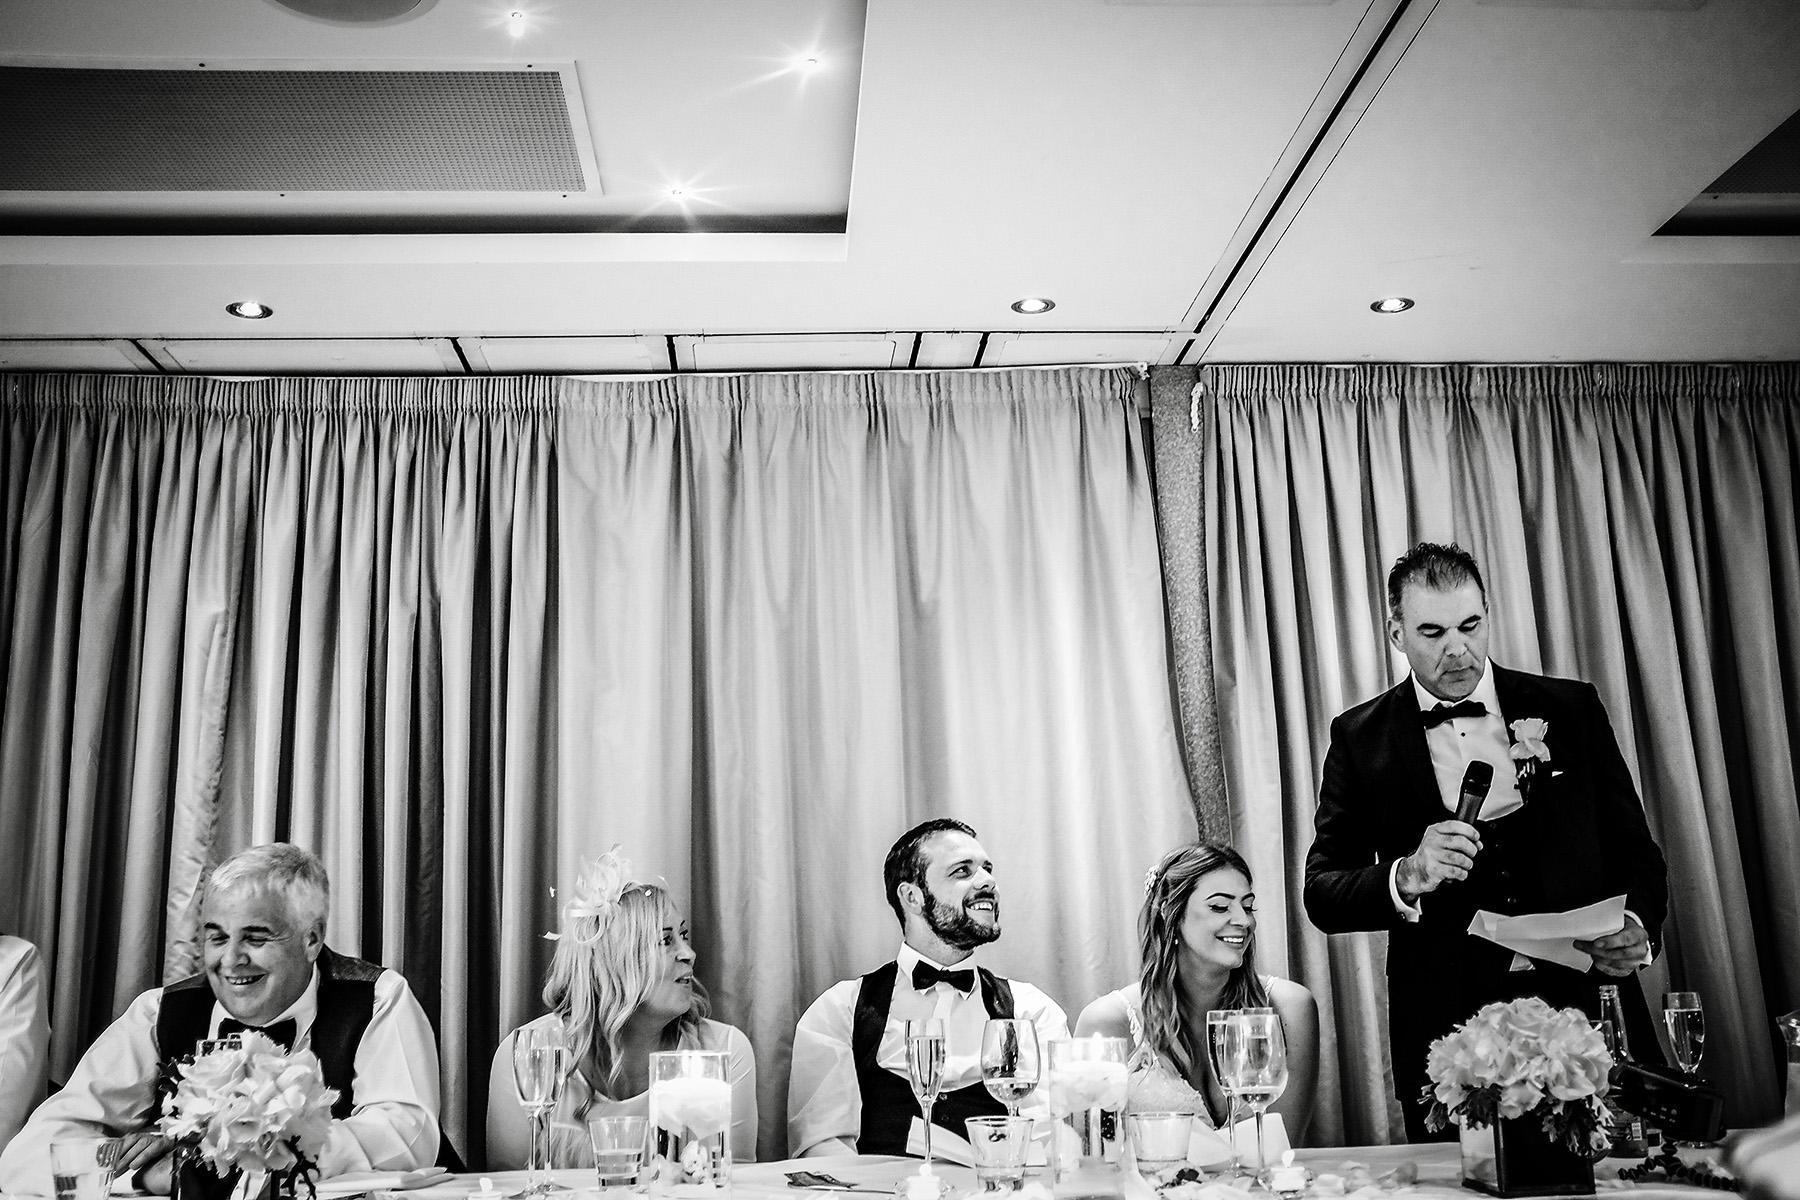 Moddershall Oaks wedding photos of speeches